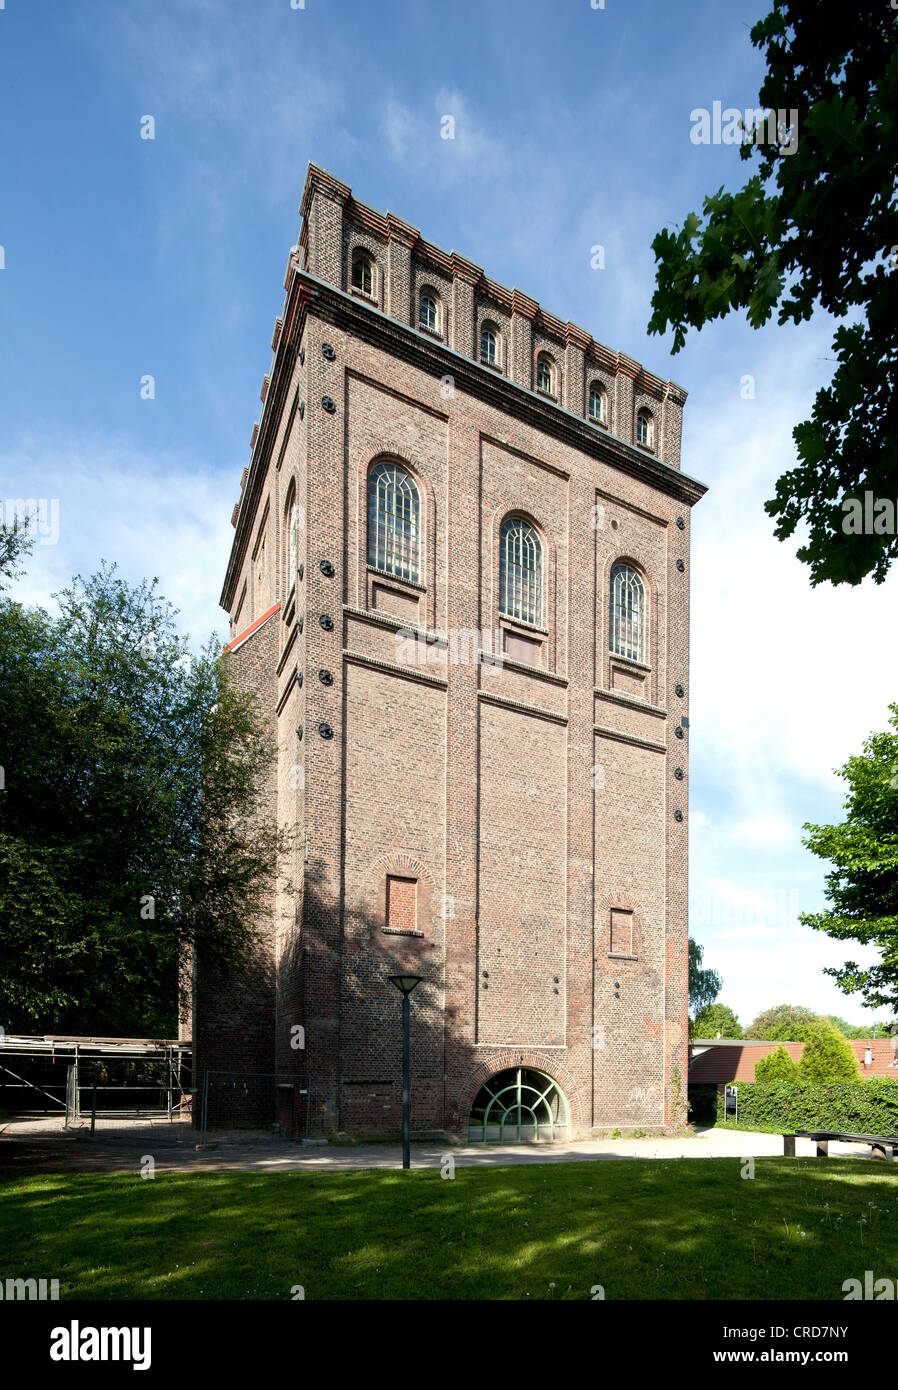 Malakow Torre de la antigua mina de Julius Philipp, Medicina colección histórica de la Ruhr-Universität Imagen De Stock